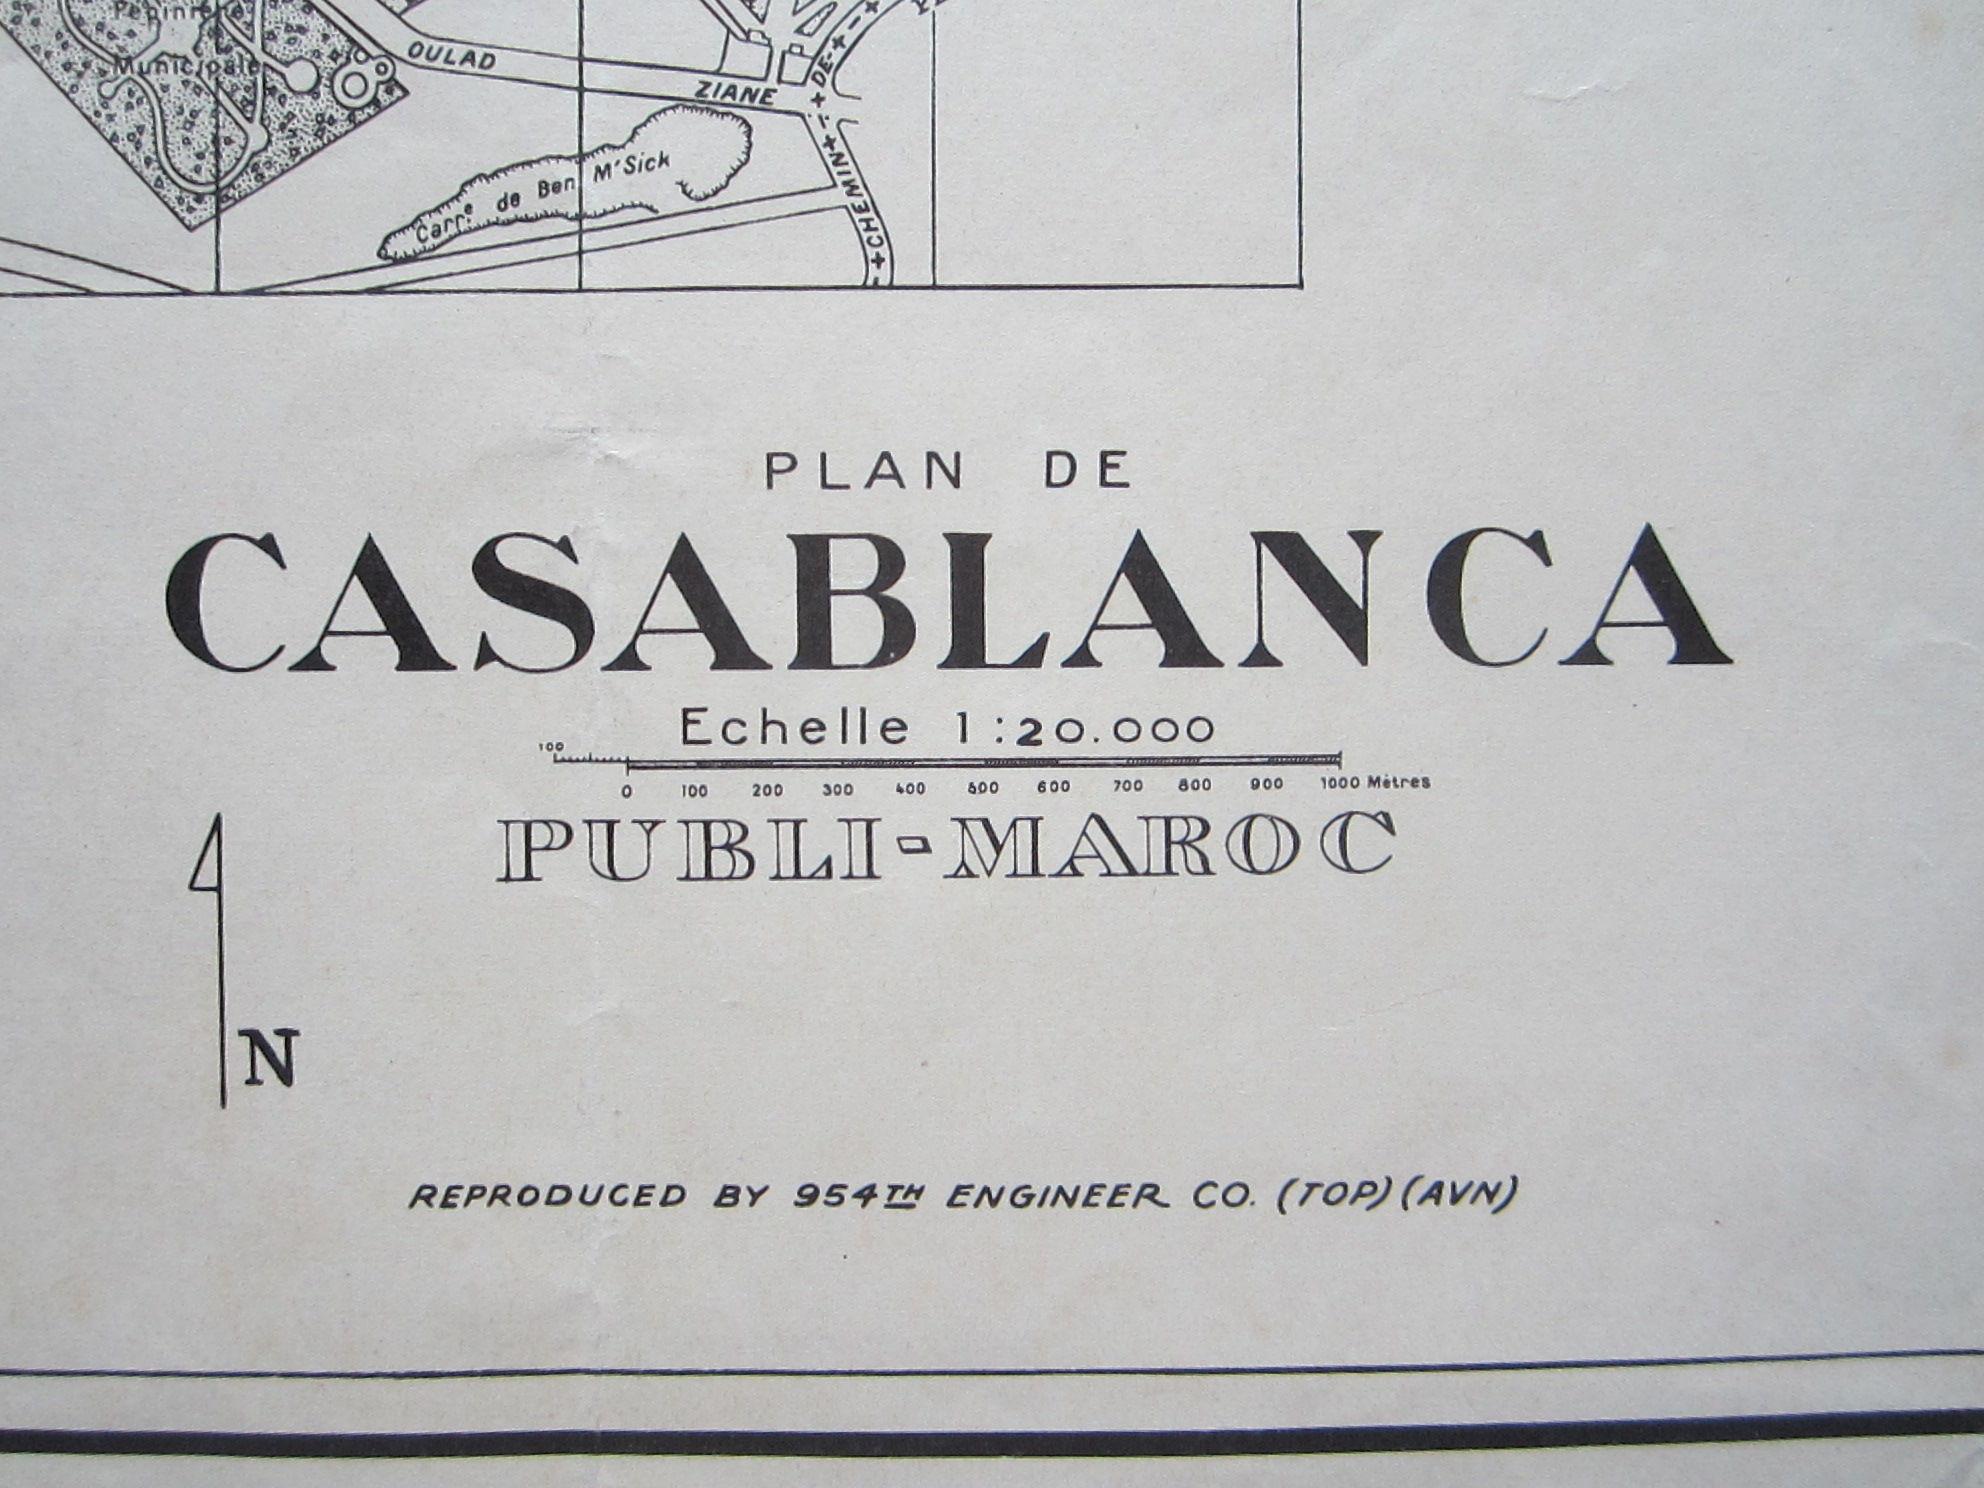 Plan de Casablanca … Reproduced by 954th Engineer Co. (TOP) (AVN) (photo 1)